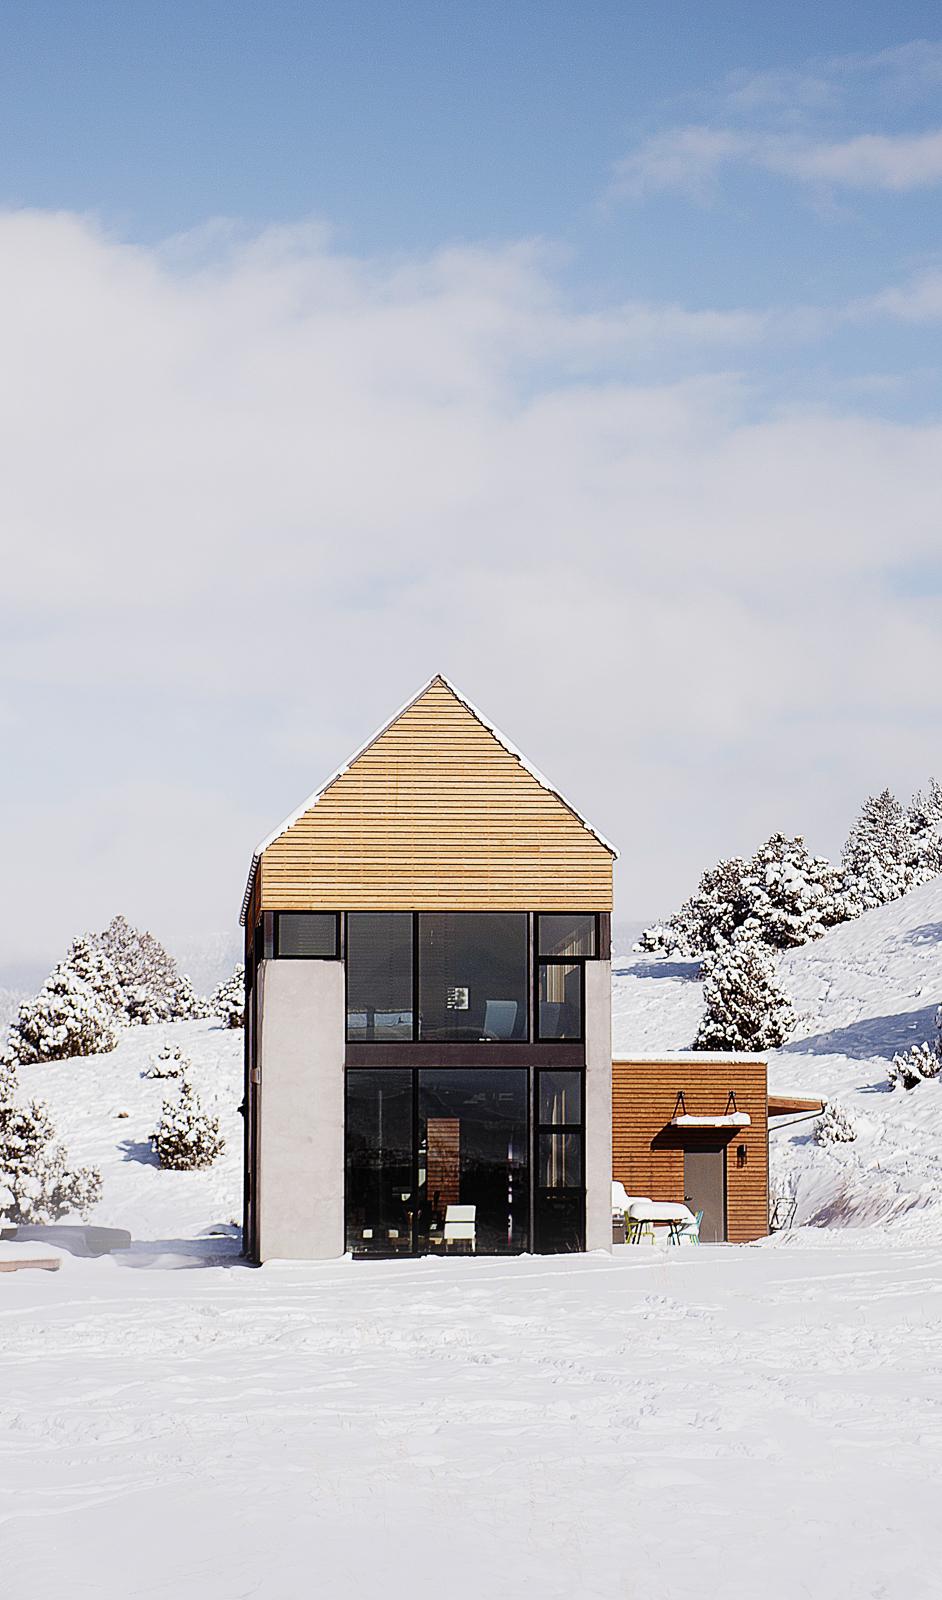 Woodworks-West-Bozeman-Montana-Builder-Cabinetry-Remodel-New-Construction-4613.jpg